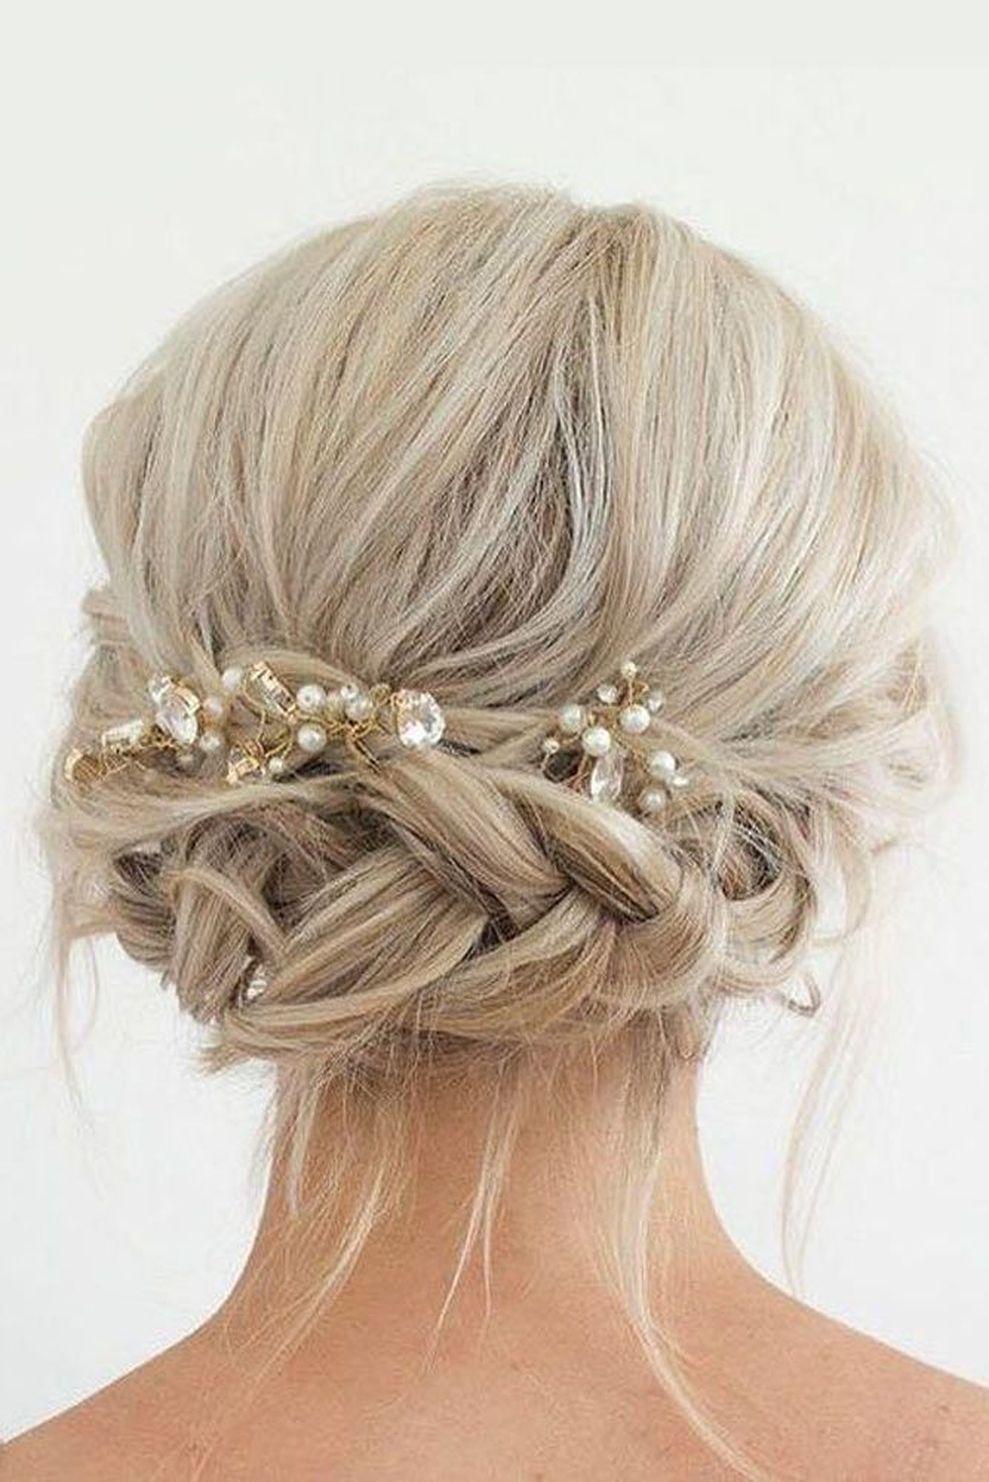 44 beautiful wedding hairstyle ideas for medium length hair